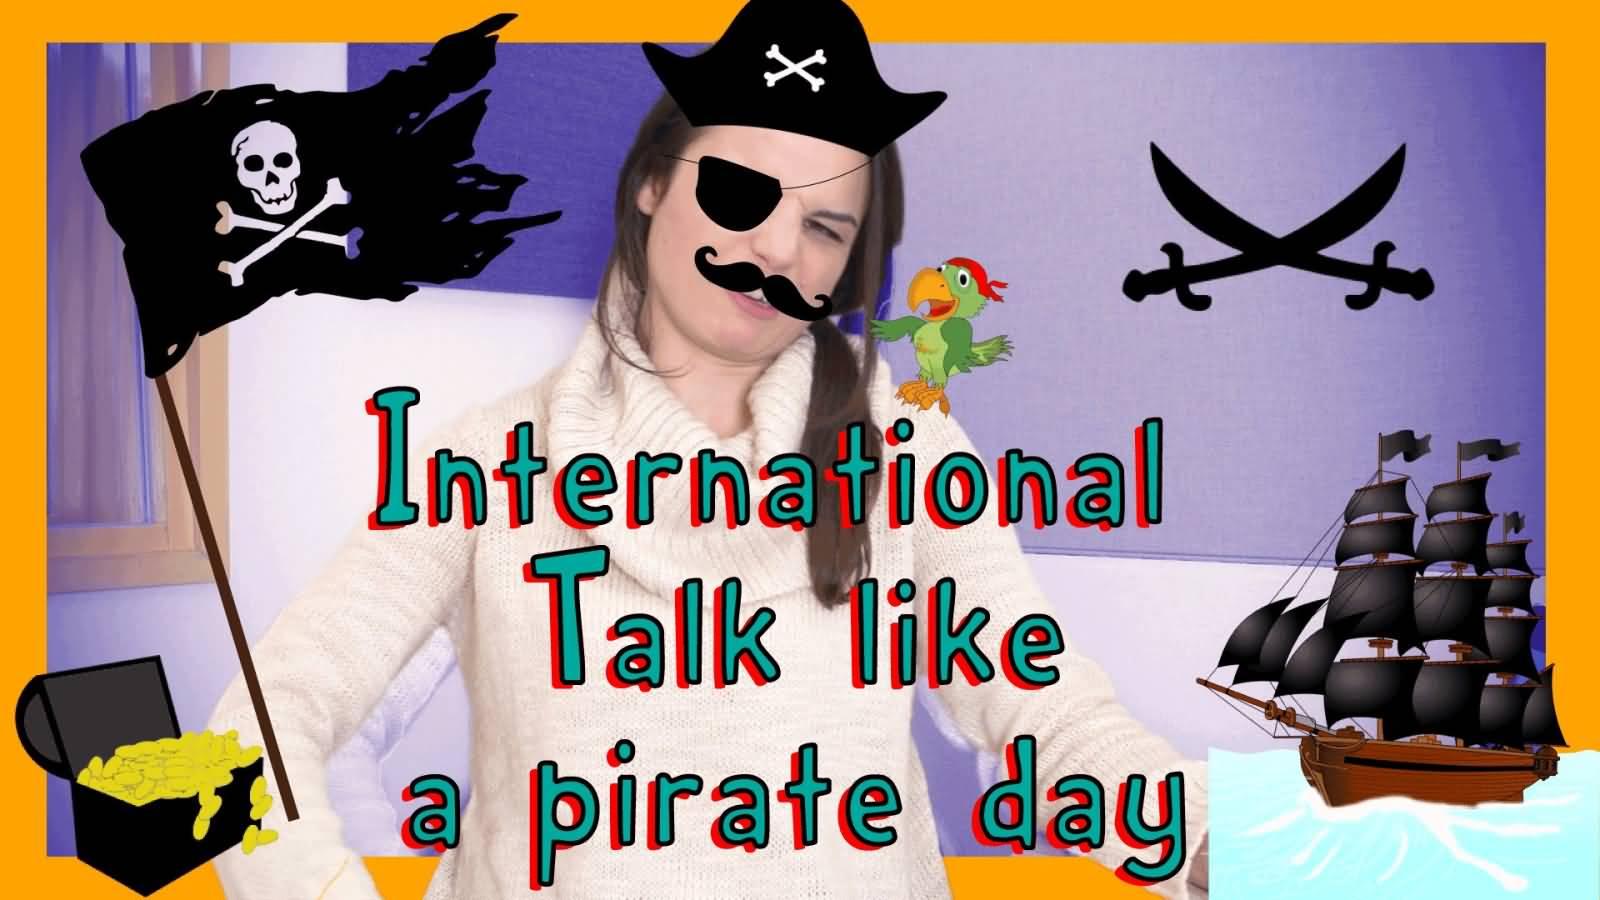 talk like a pirate day - photo #28